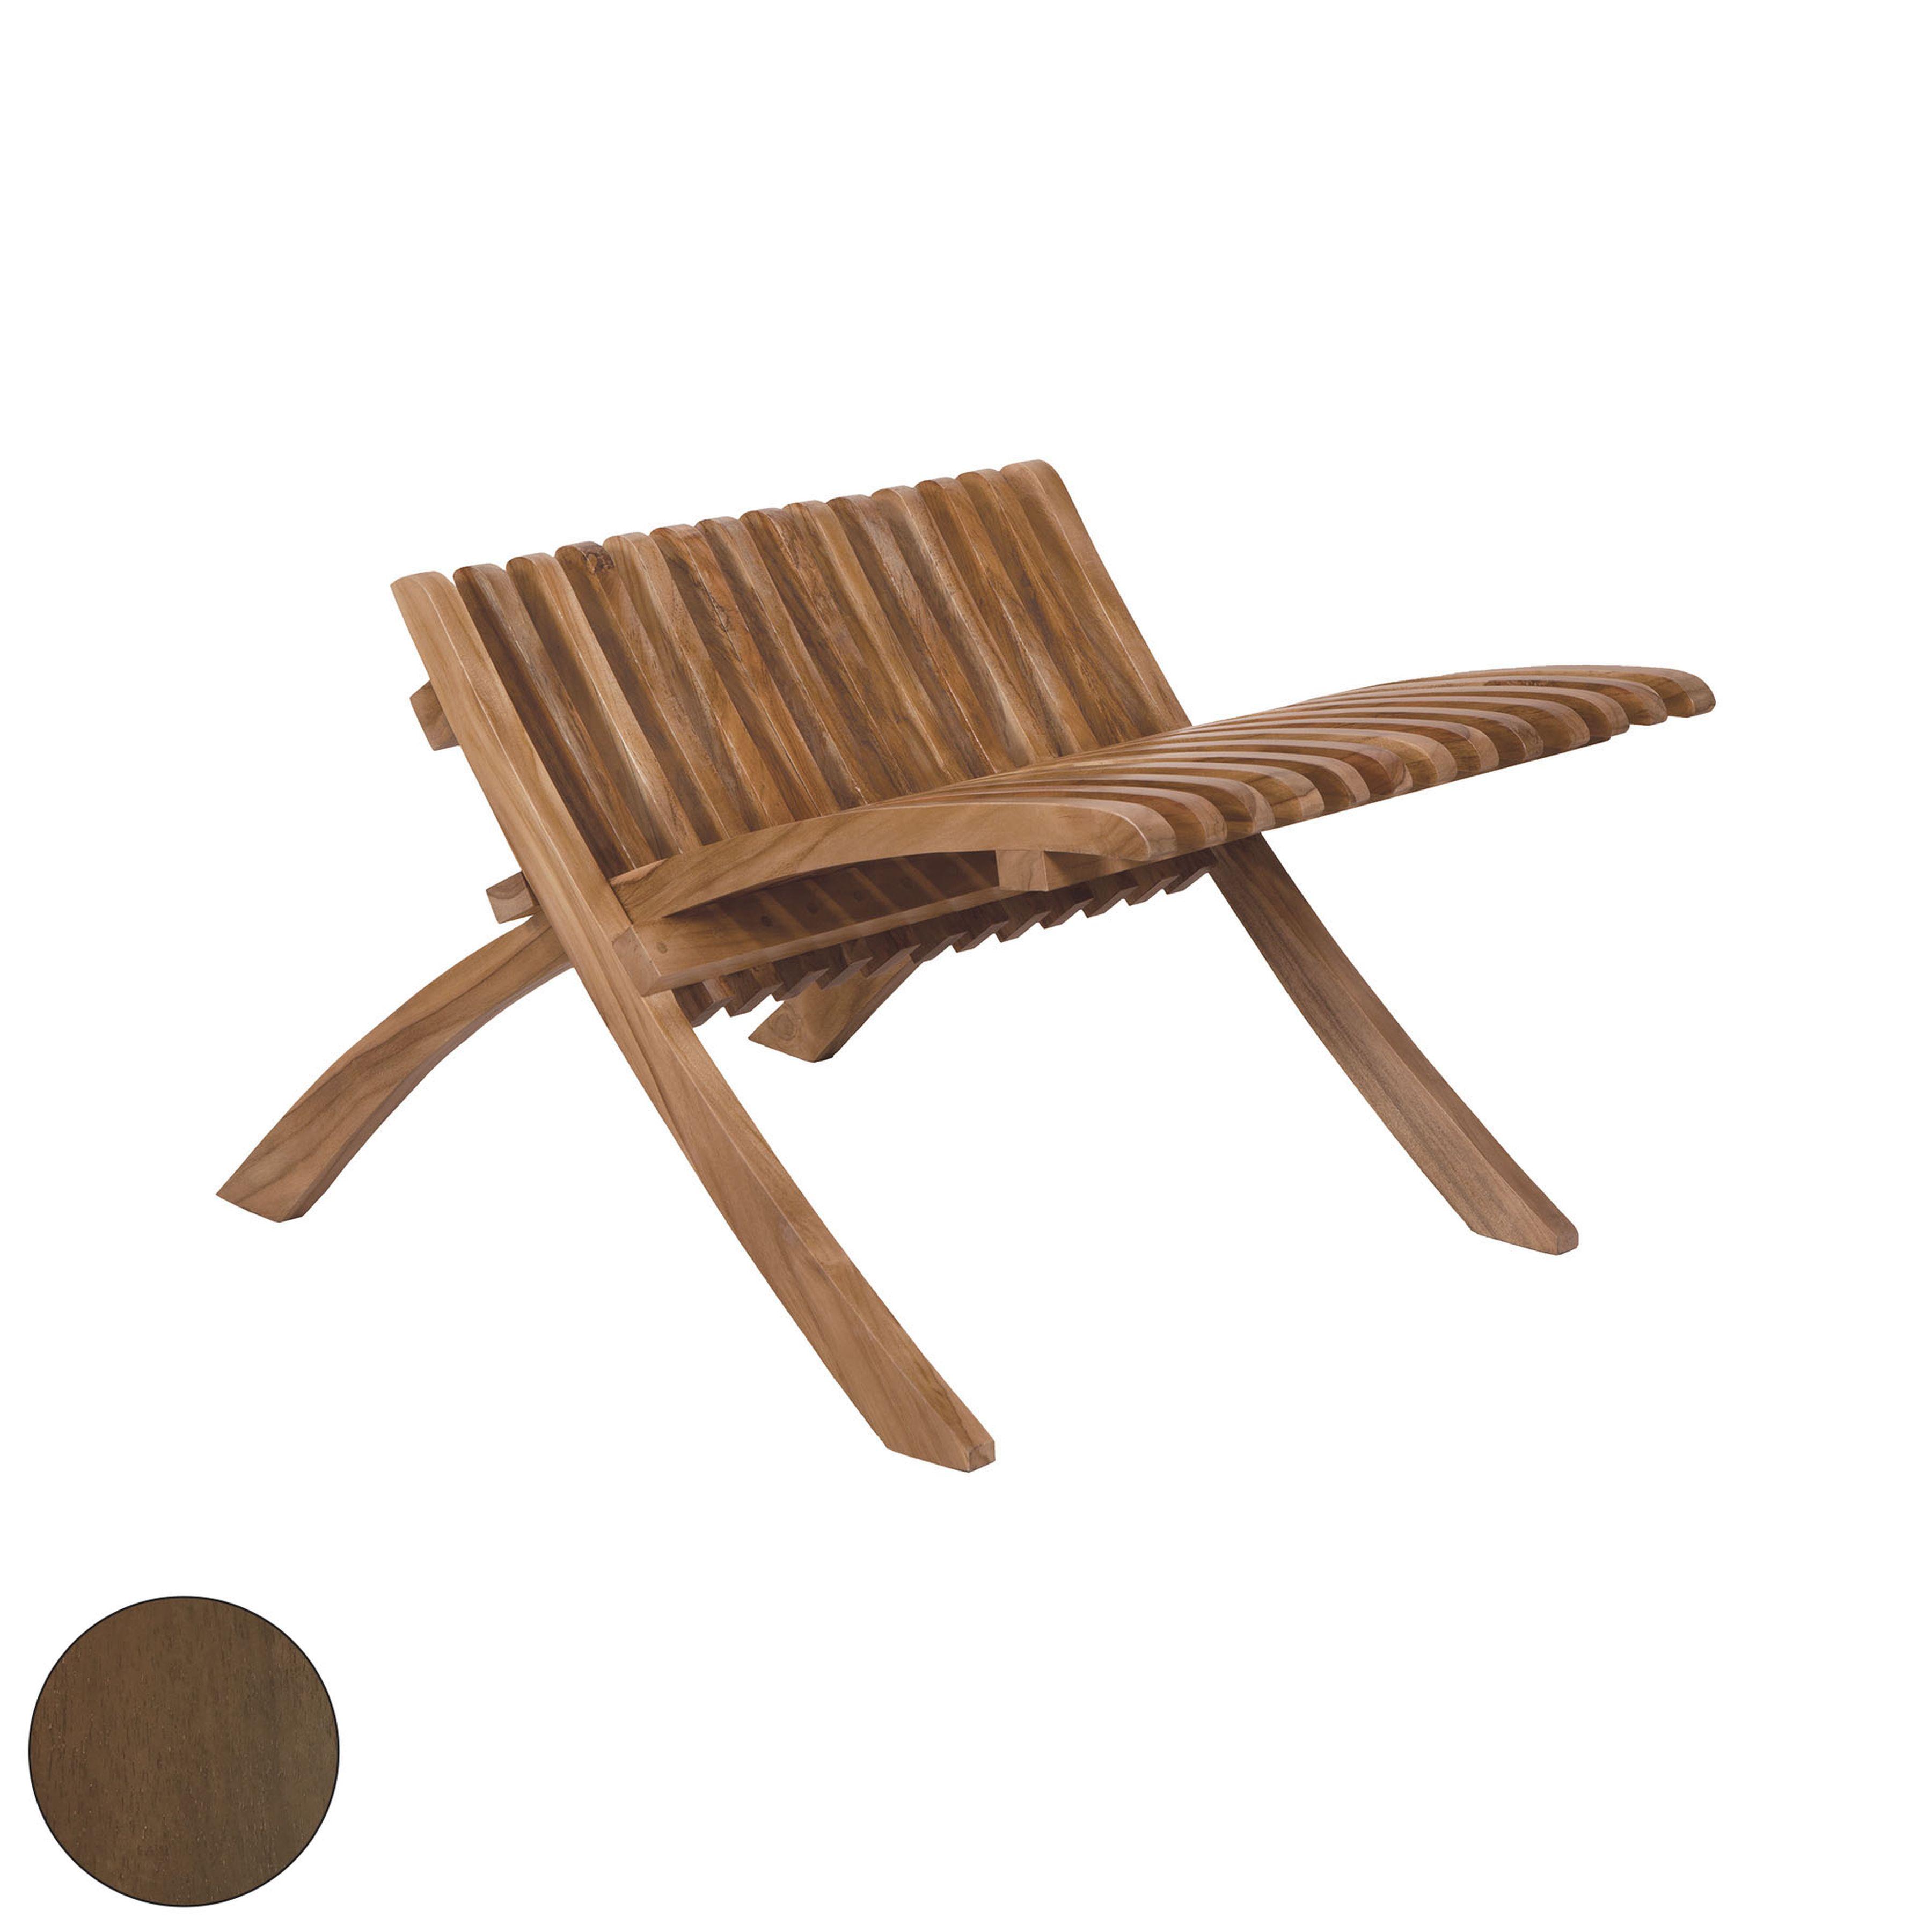 Teak Folding Footrest 6517515BU | ELK Home